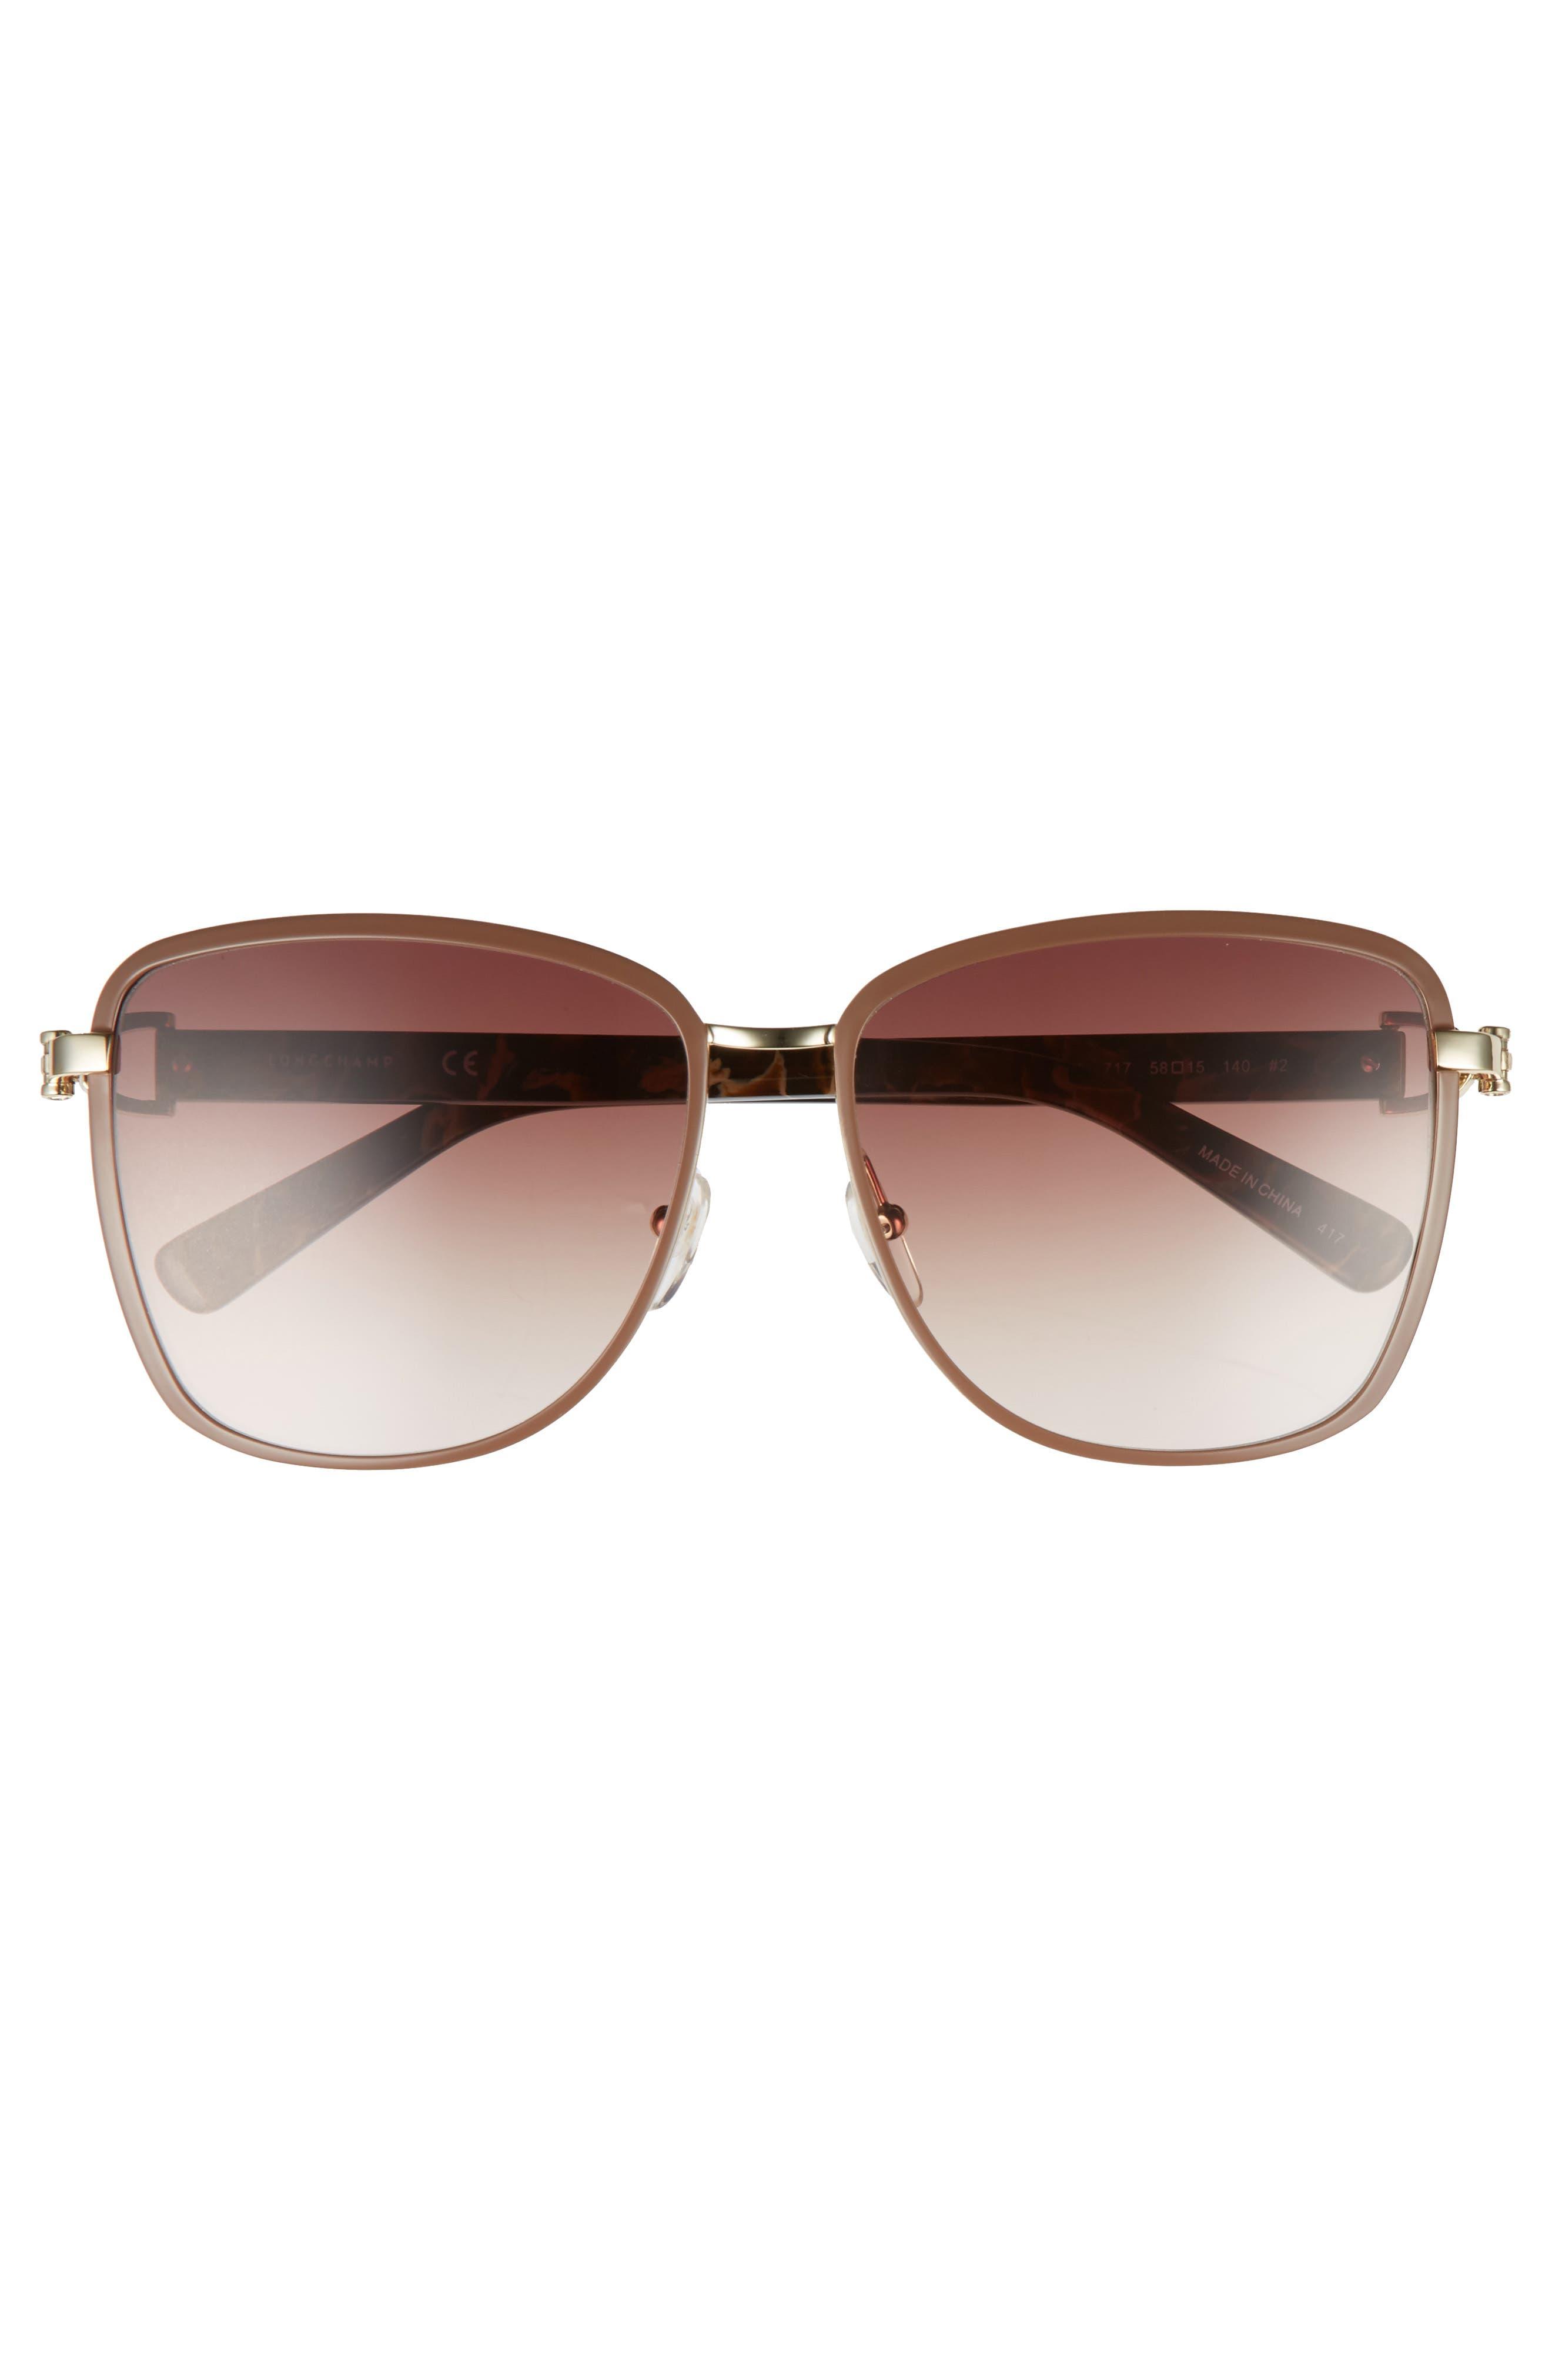 58mm Metal Sunglasses,                             Alternate thumbnail 3, color,                             Gold/ Brown